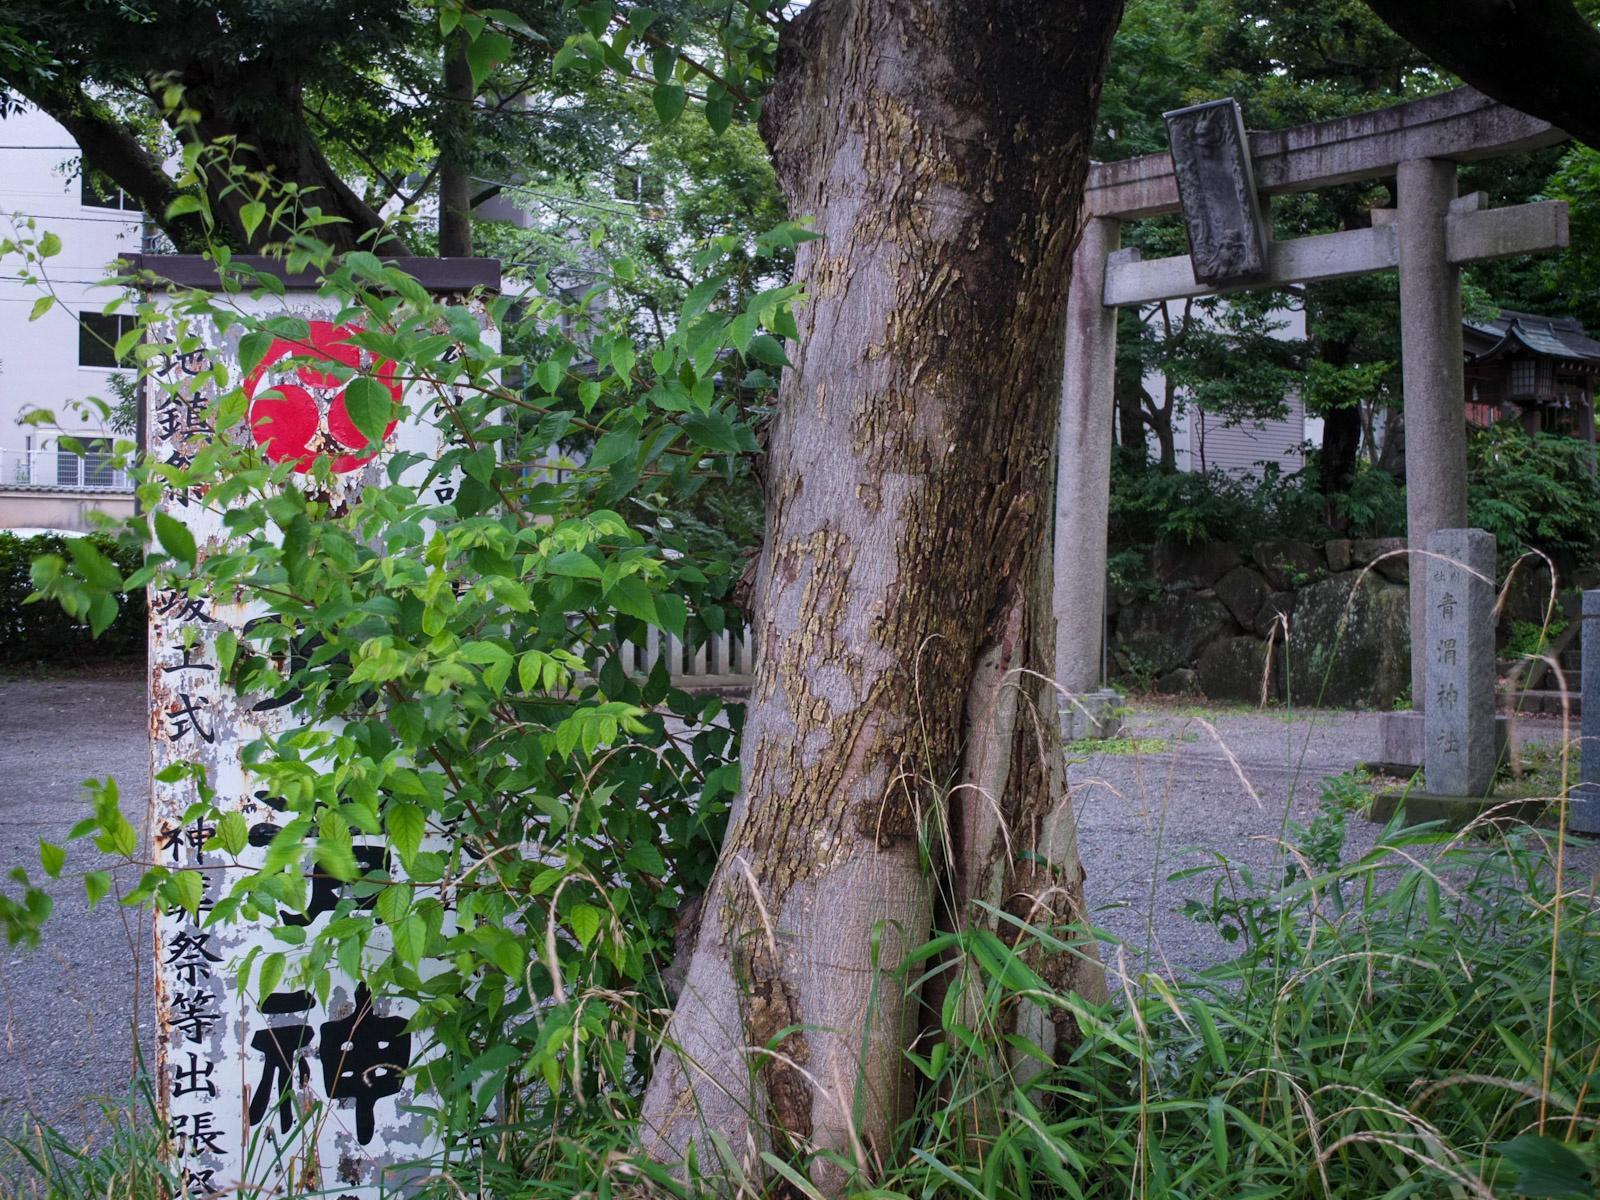 f:id:Yamadamado:20200706163552j:plain